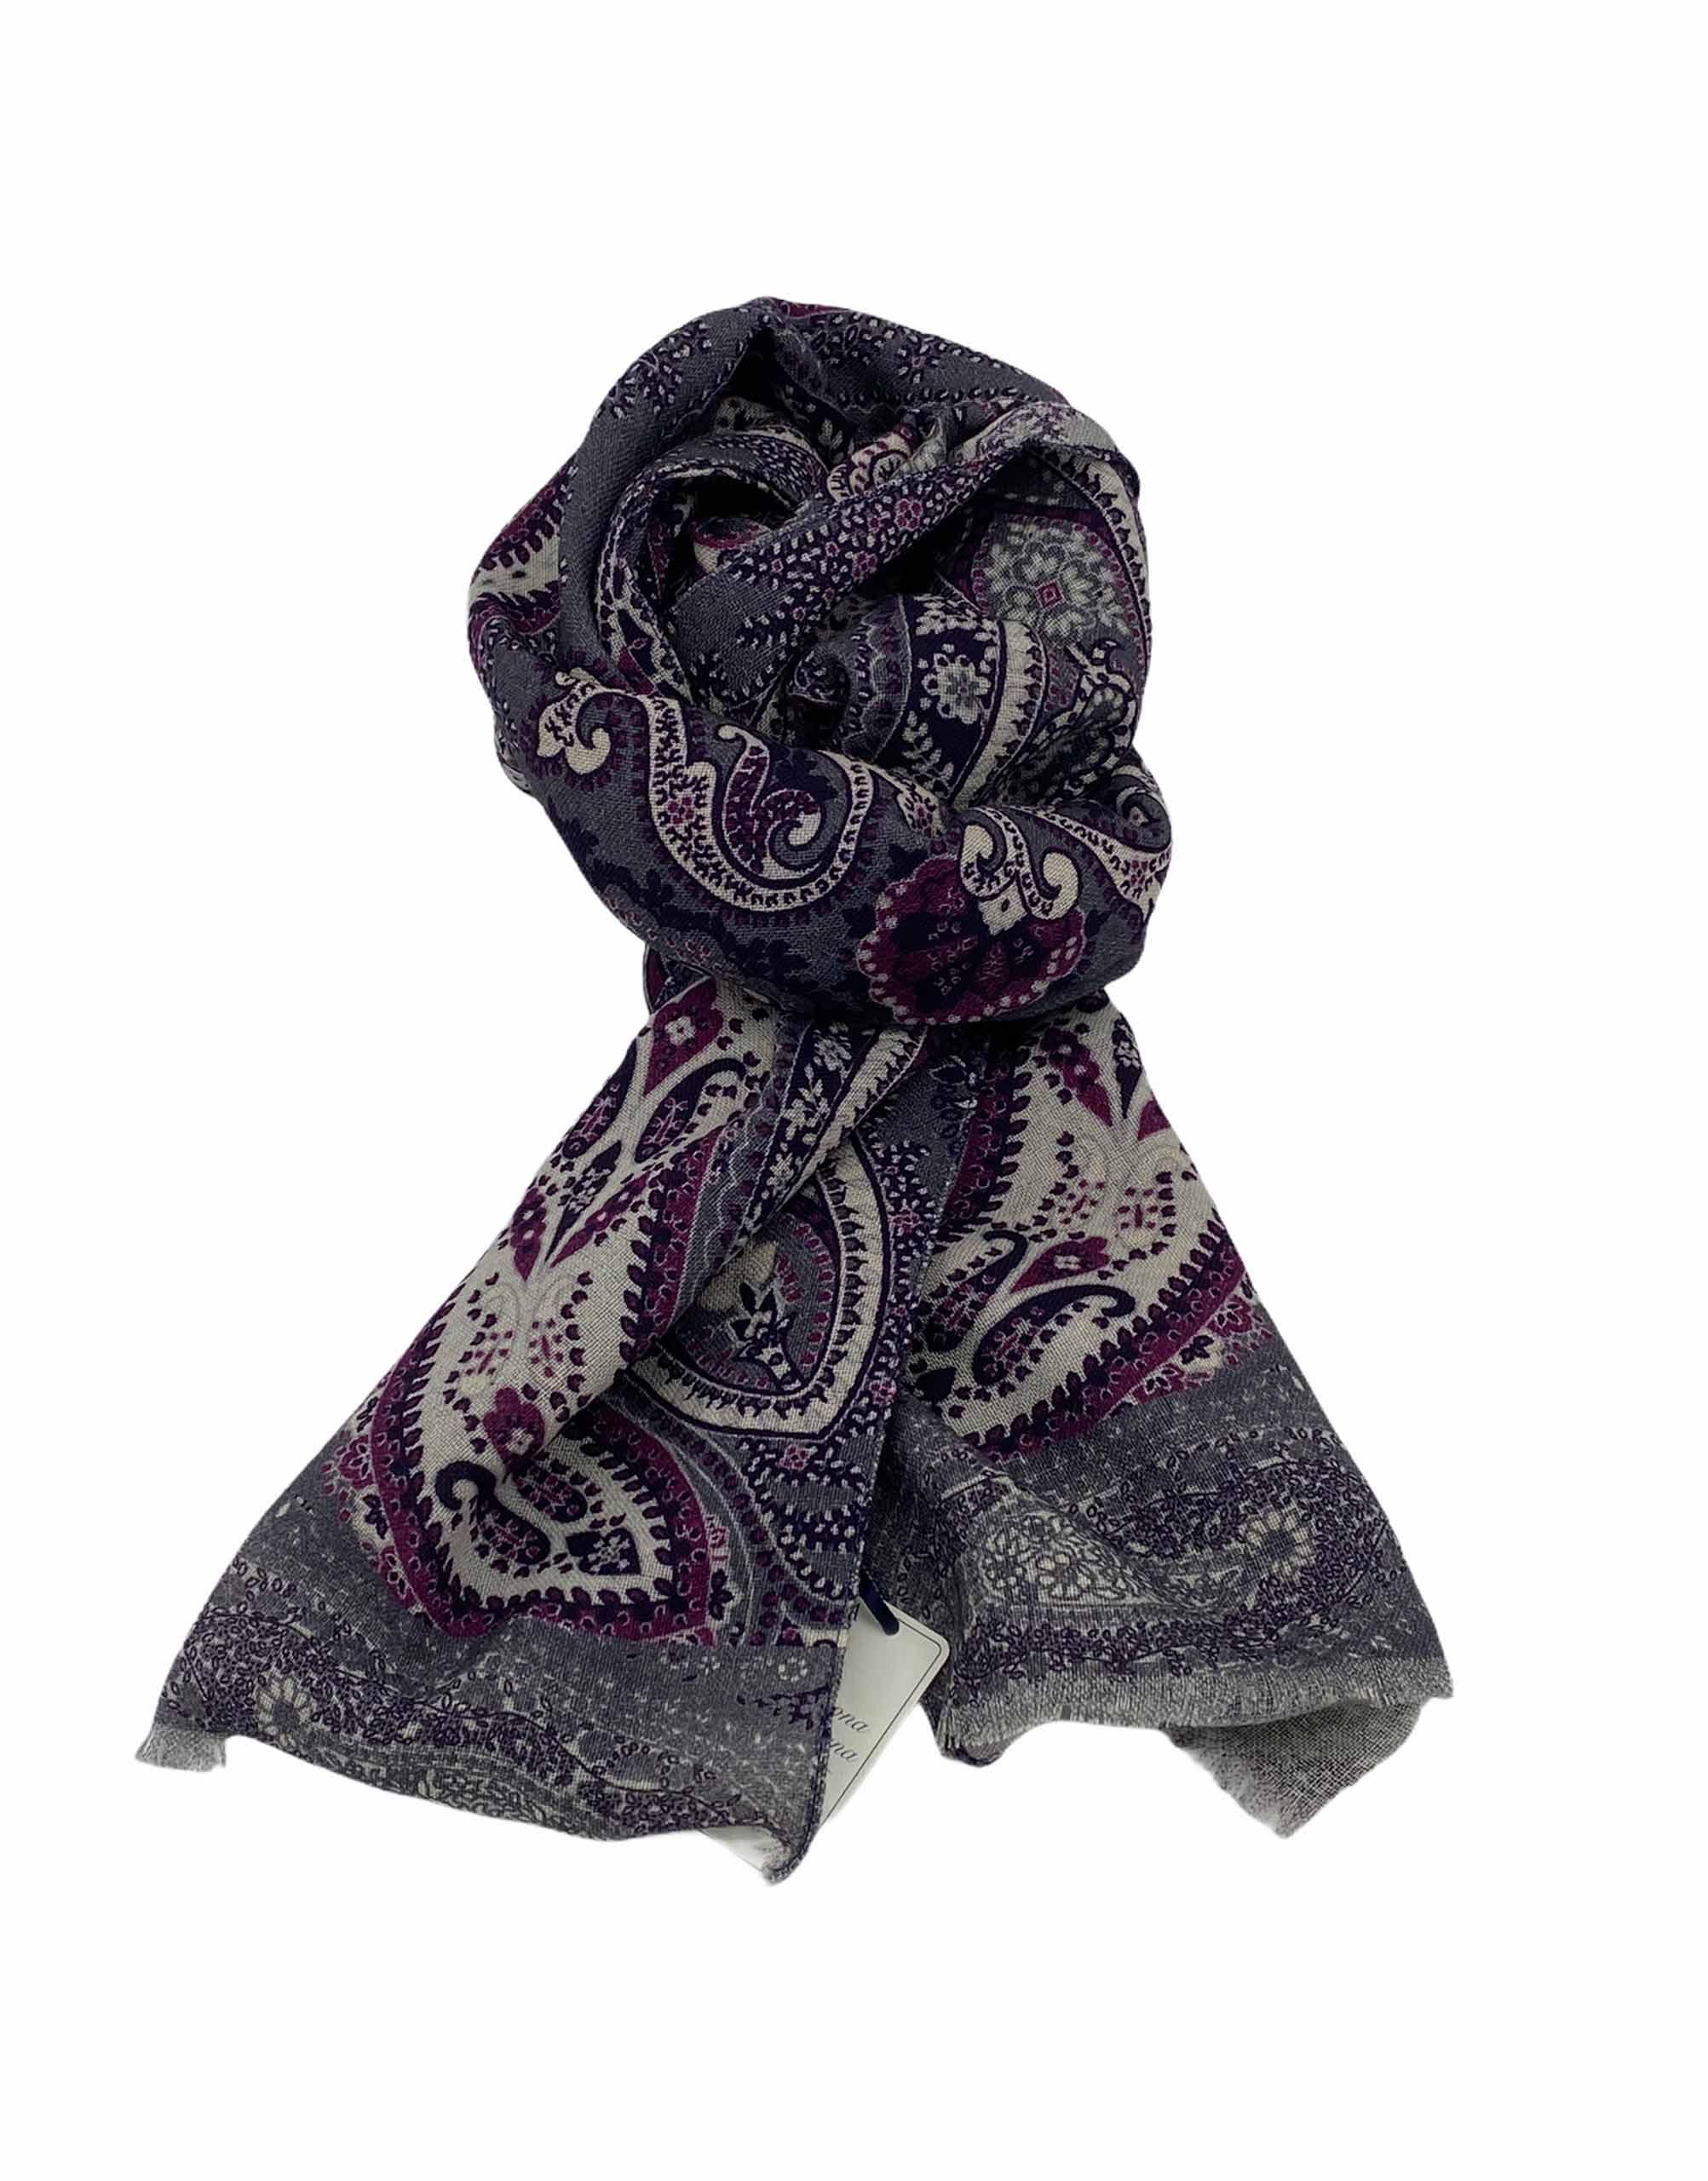 pashmina buona fortuna exclusivas comprar online moda italiana foulards shop gris purpura